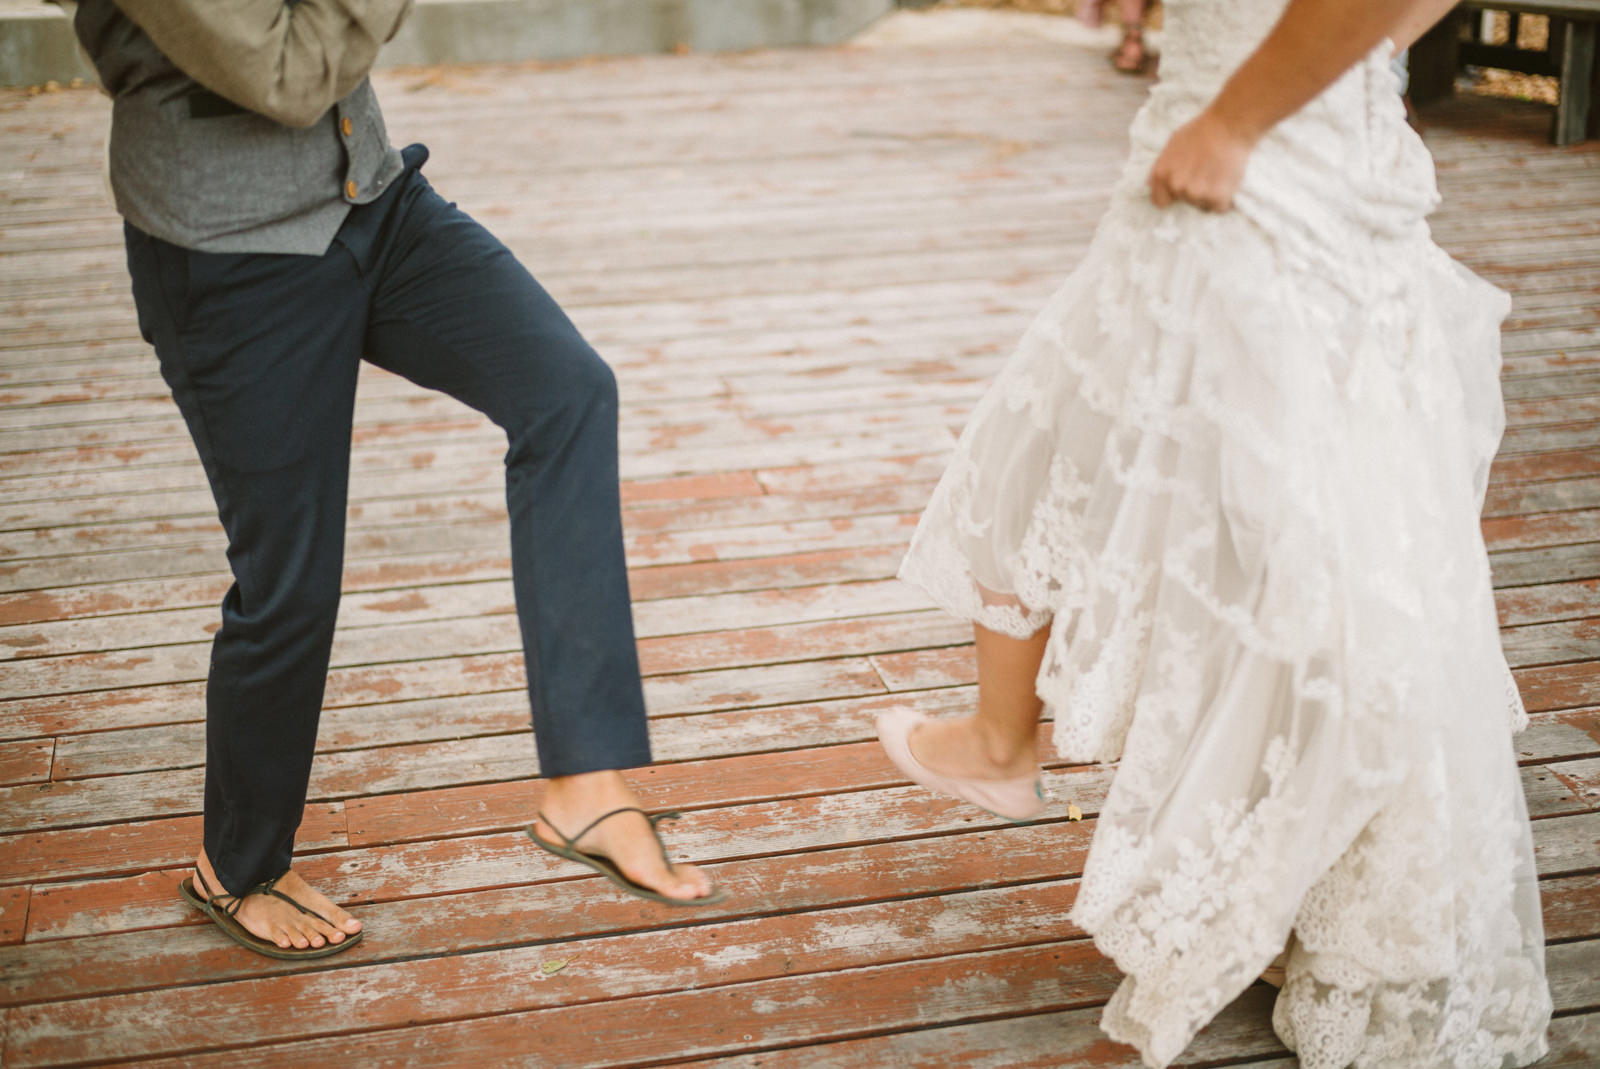 rivers-bend-retreat-wedding-100 RIVER'S BEND RETREAT WEDDING